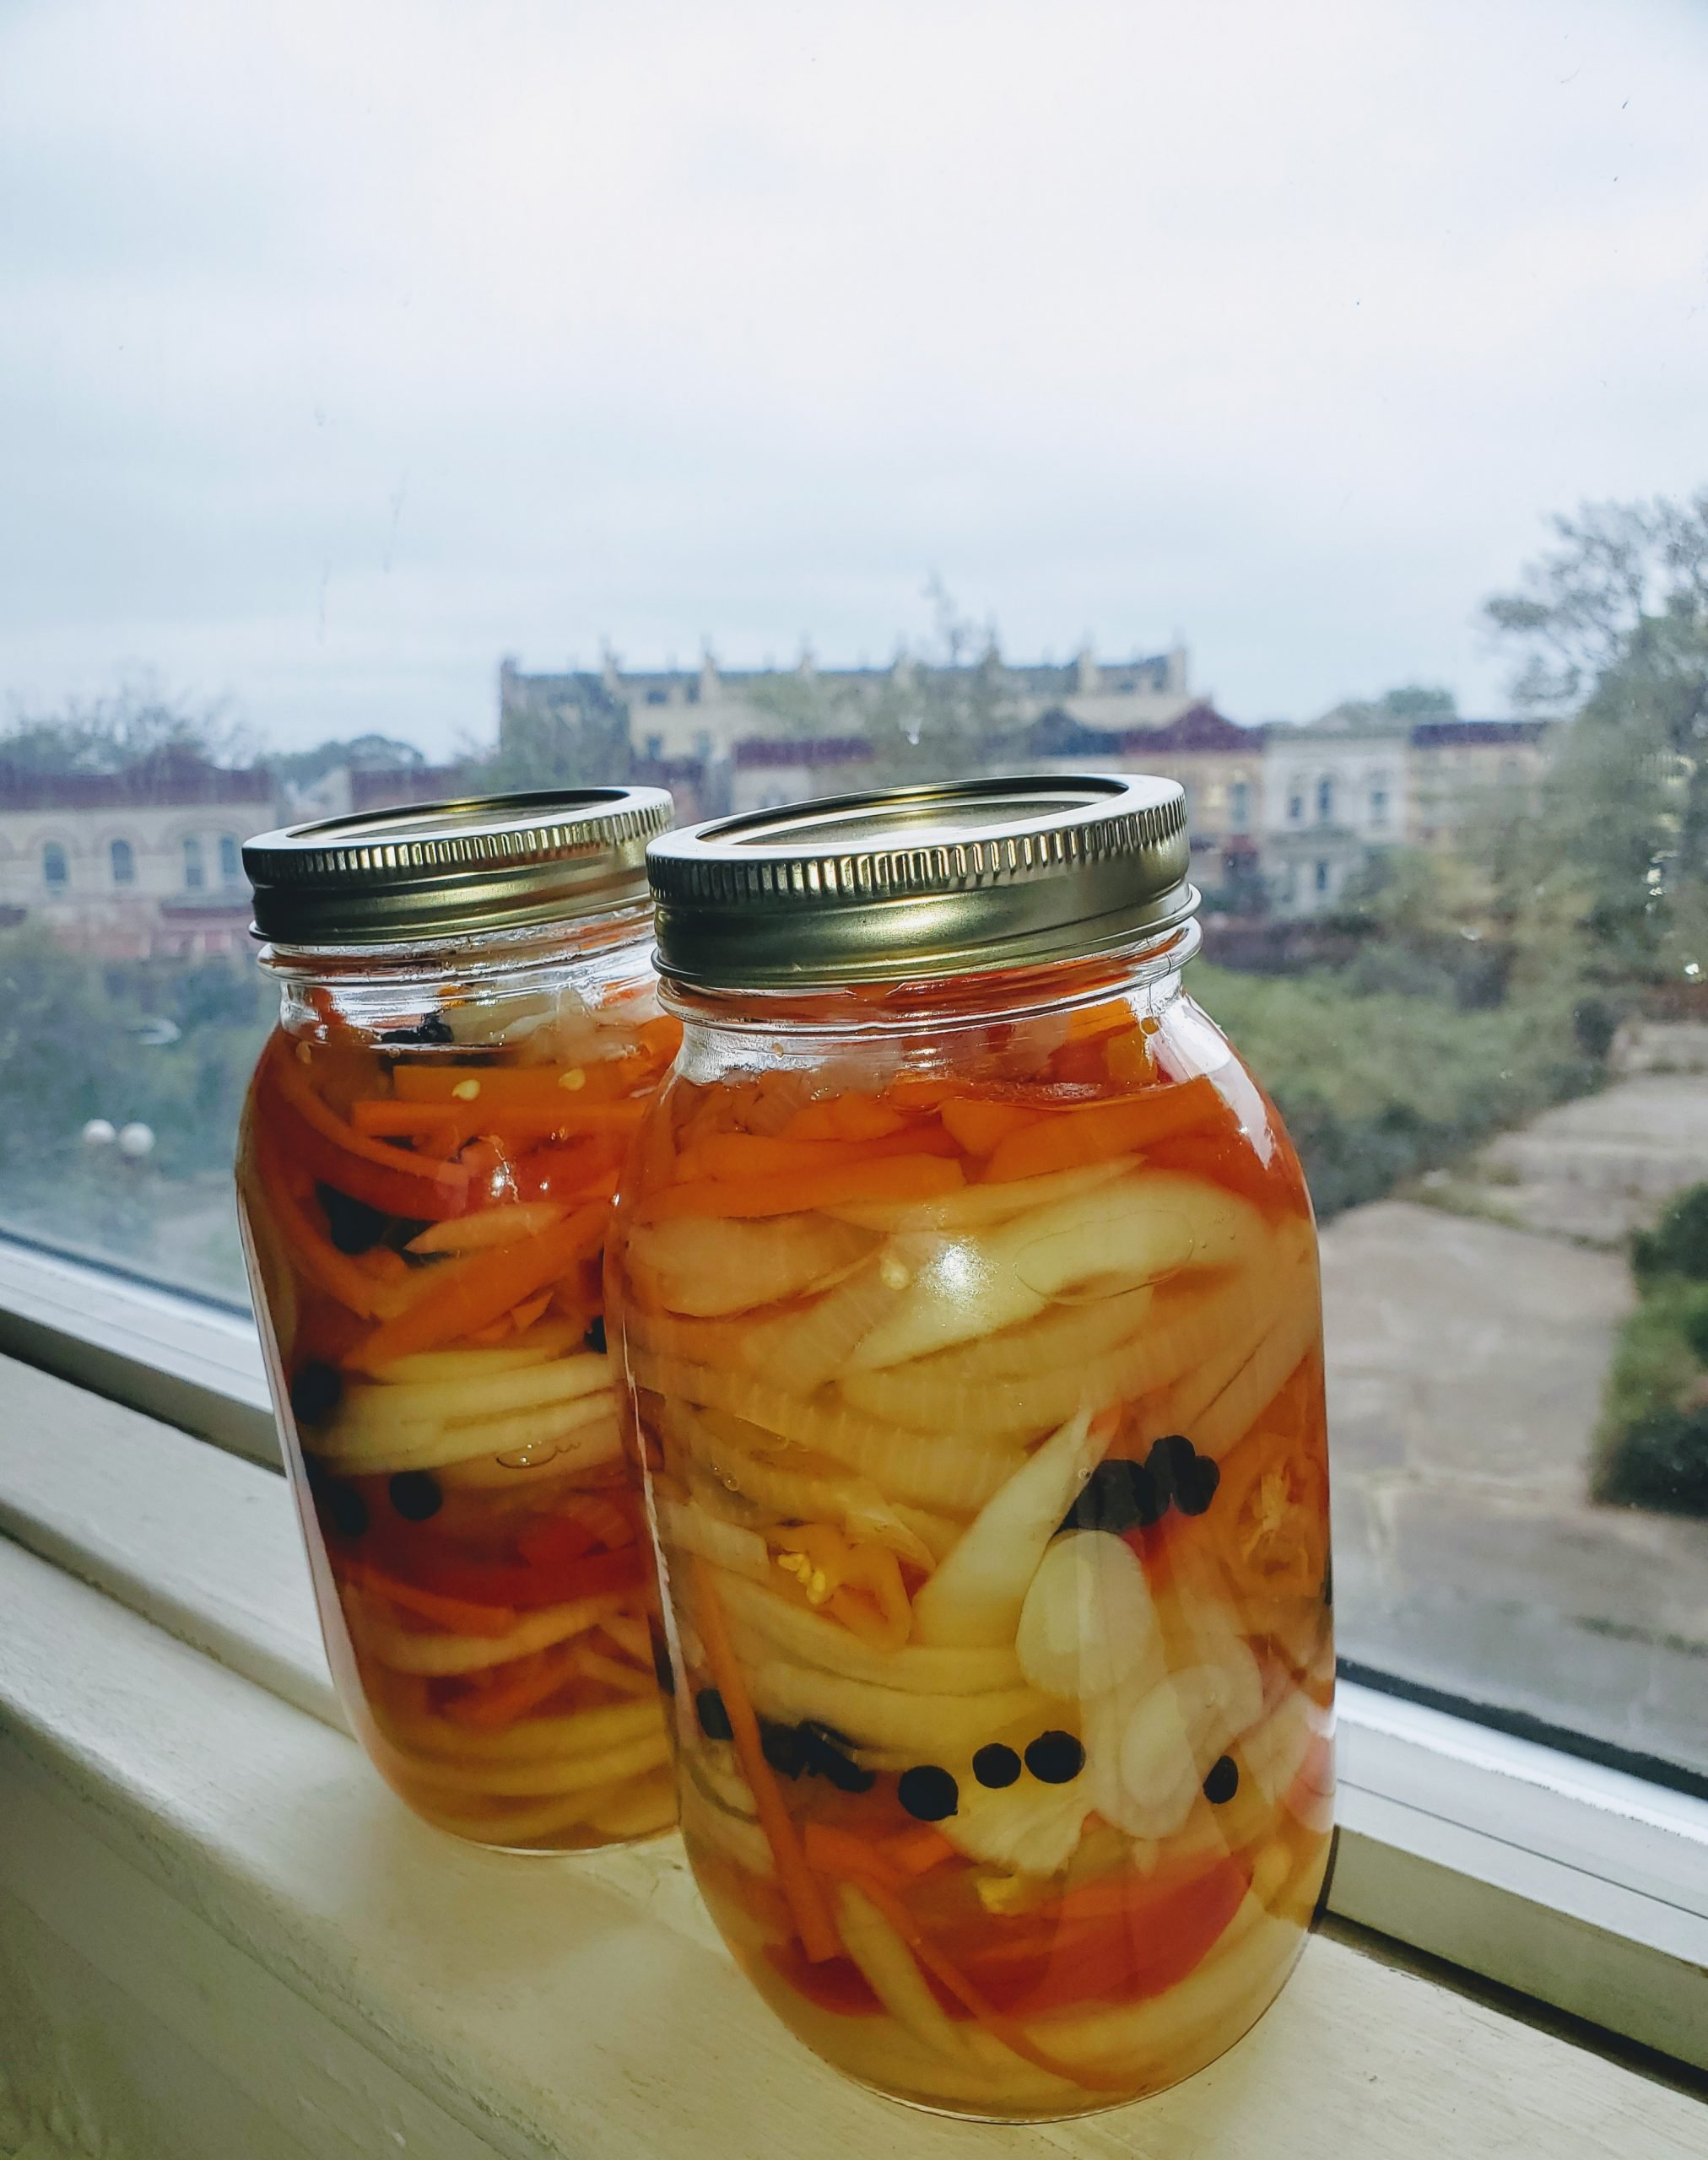 escovitch sauce